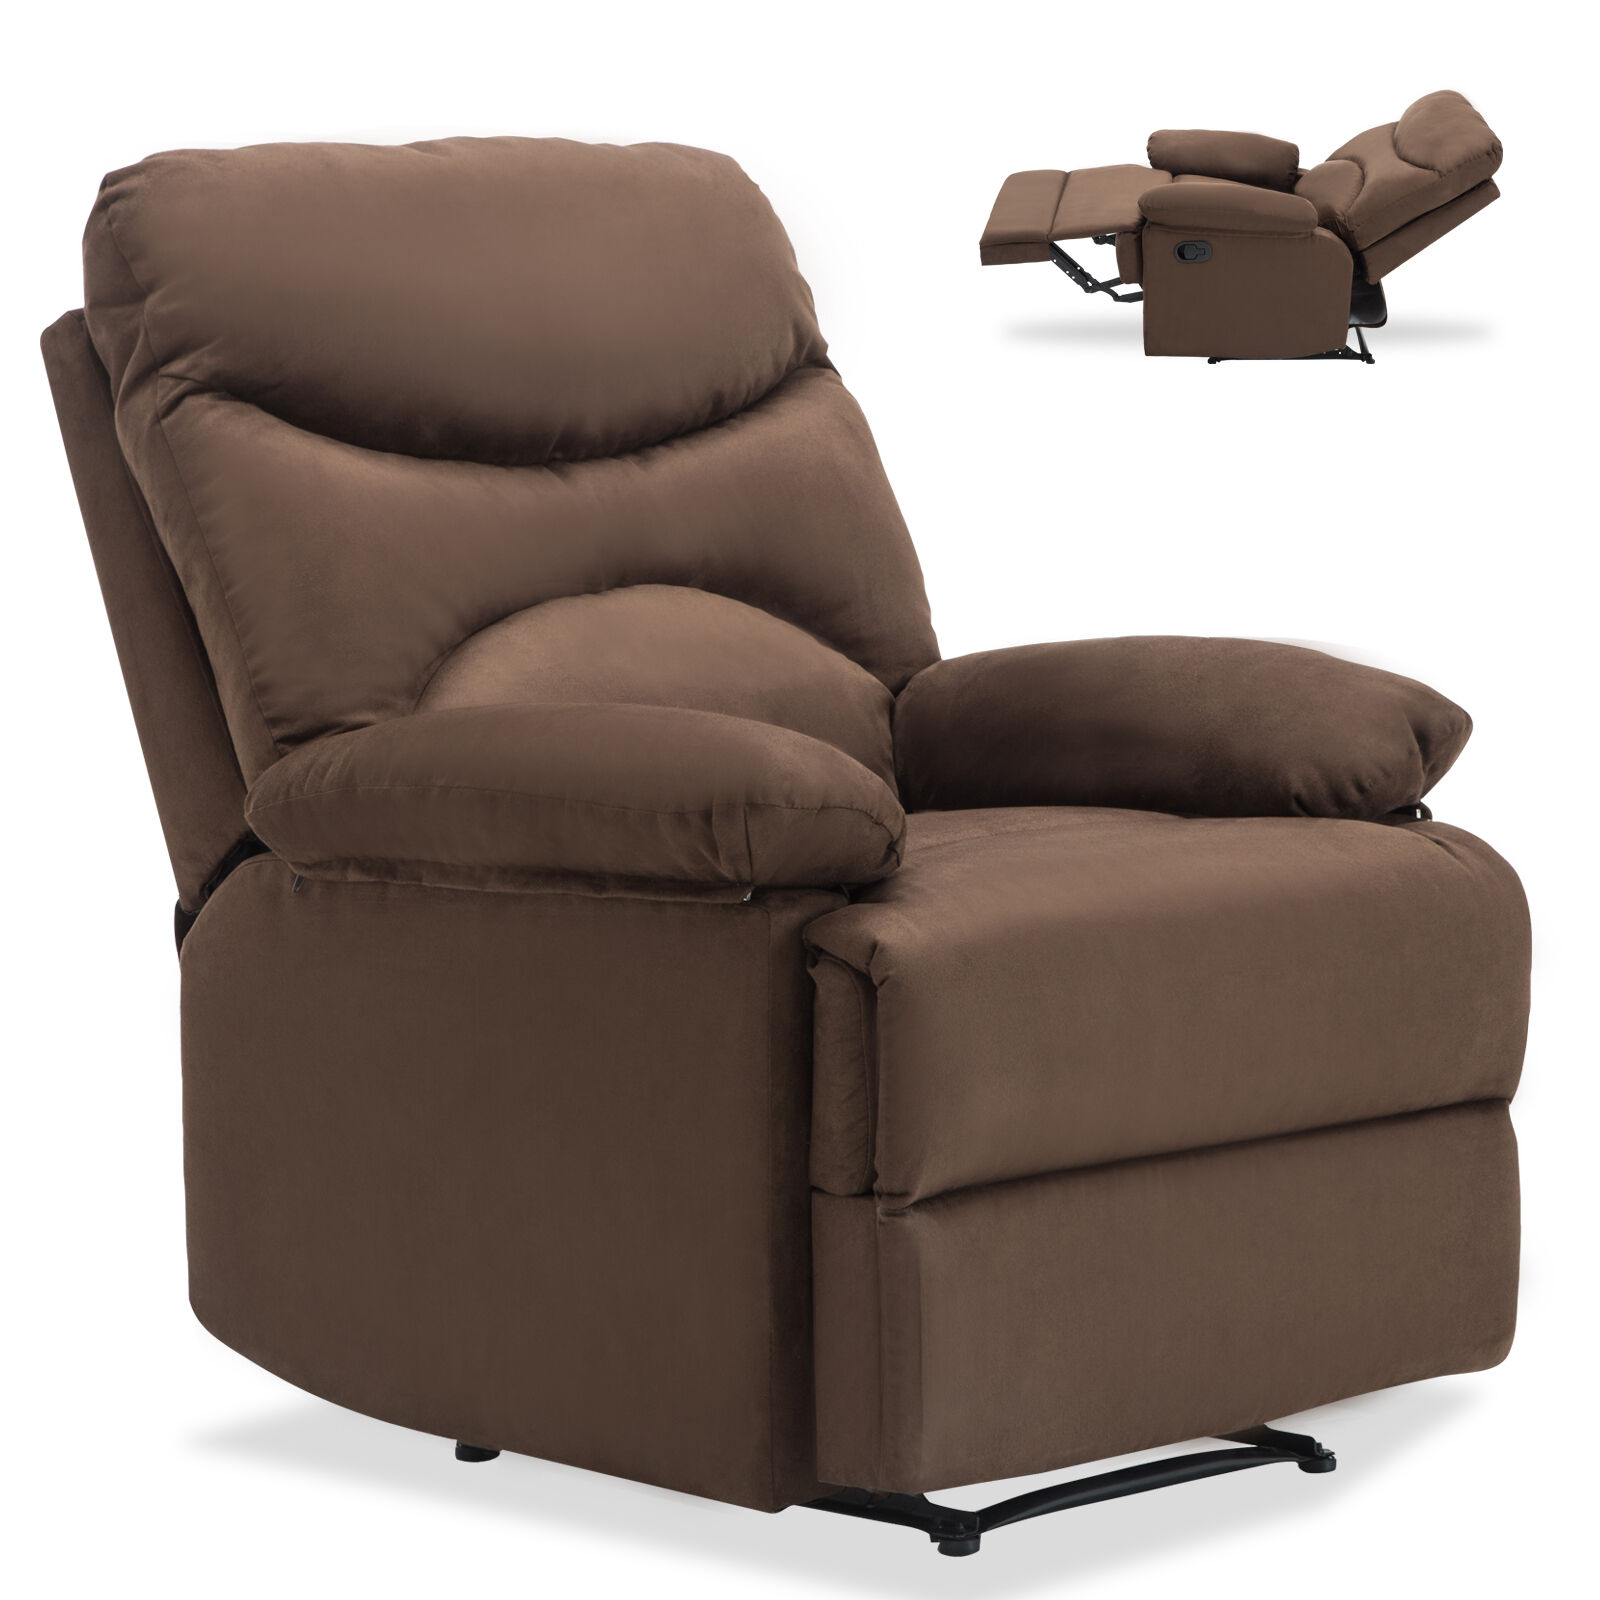 massage chair ebay cheapest folding chairs chocolate microfiber recliner sofa ergonomic